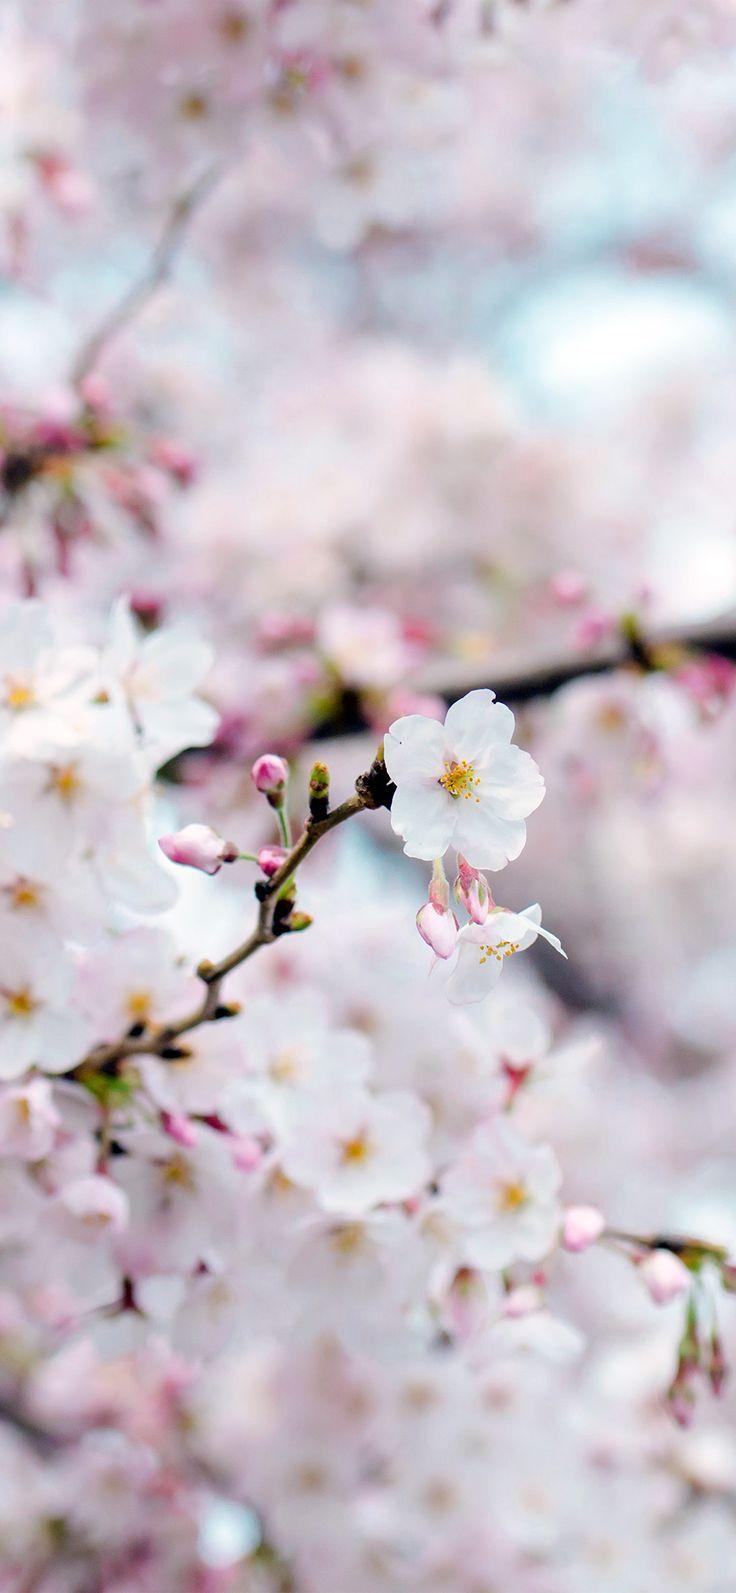 nx70-cherry-blossom-flower-spring-tree-bokeh-nature via iPhoneXpapers.com – Wall… – Alexis Positano